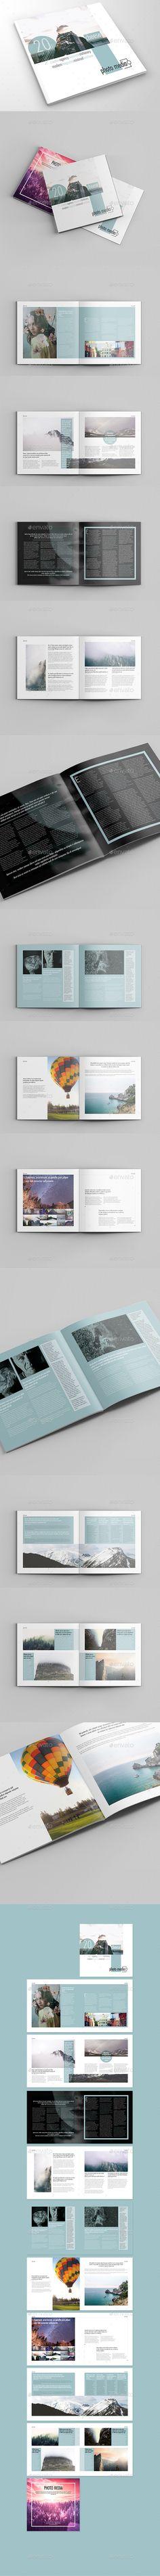 Photo Media Square Catalog&Brochure